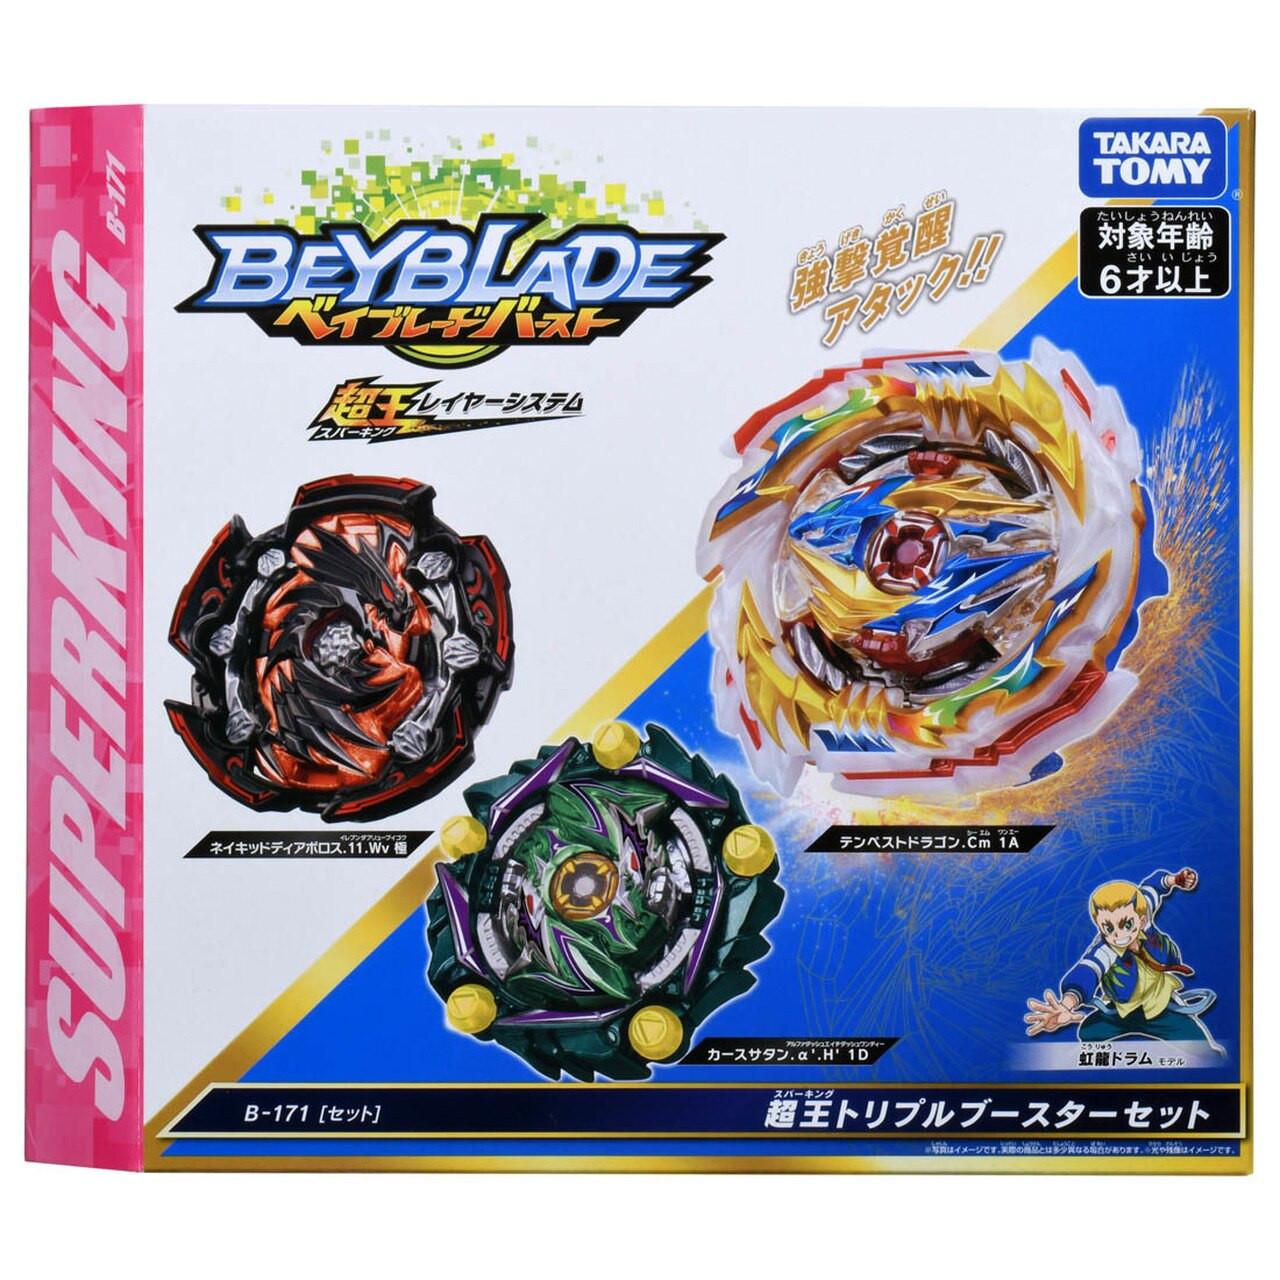 Takara Tomy Beyblade Burst B-171 Super King Triple Booster Set Mb 2D B-169 Starter Variant Lucifer